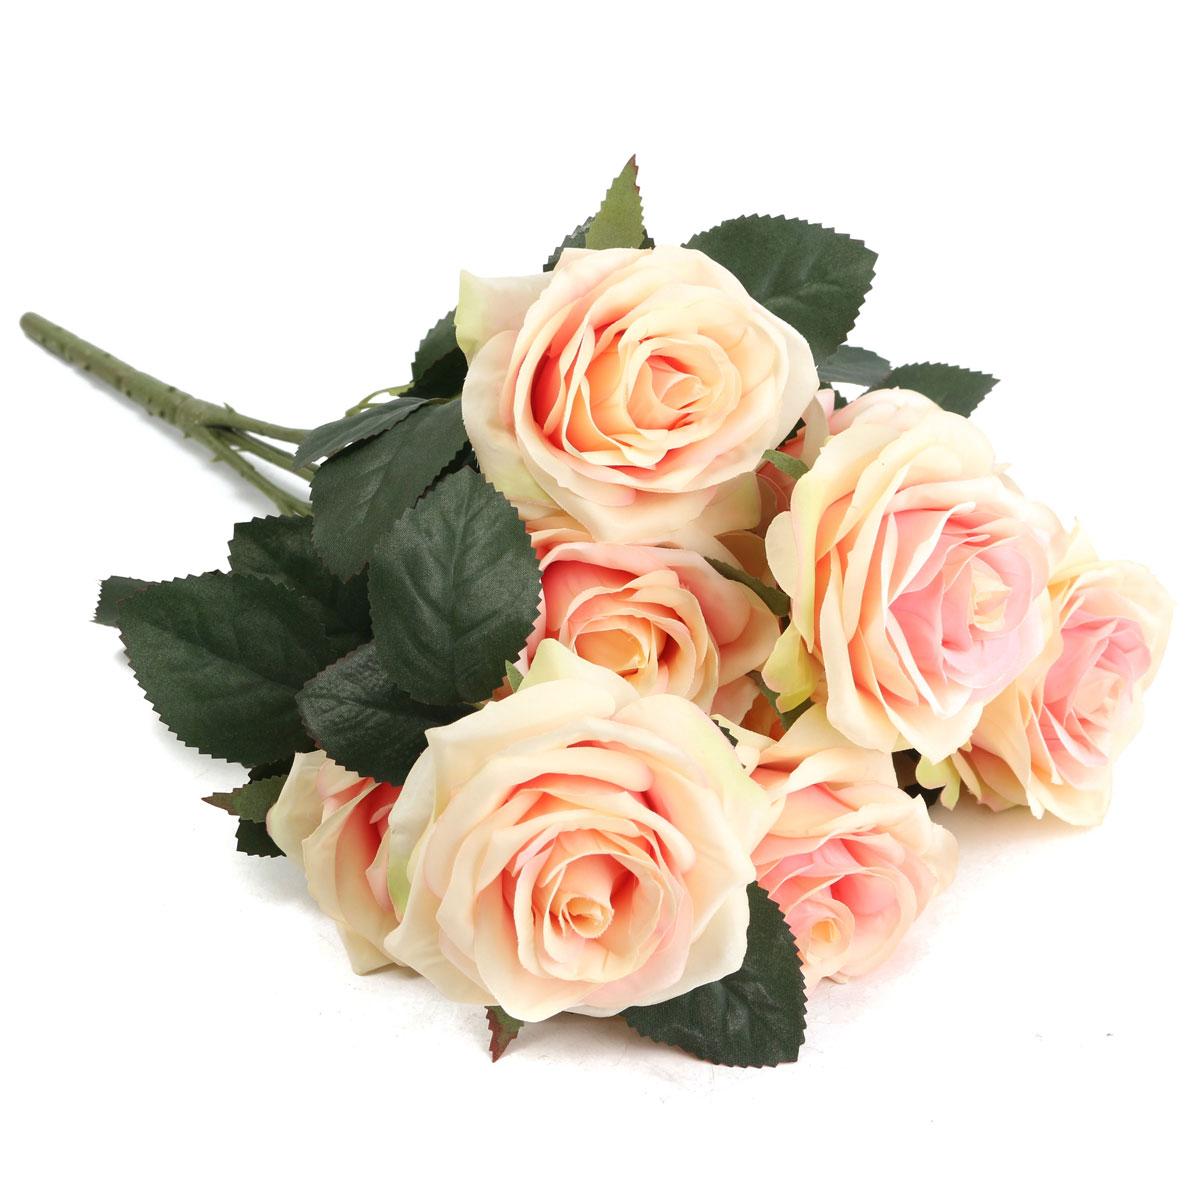 10 Heads Artificial Silk Flower Rose Wedding Bouquet Party Home Decoration